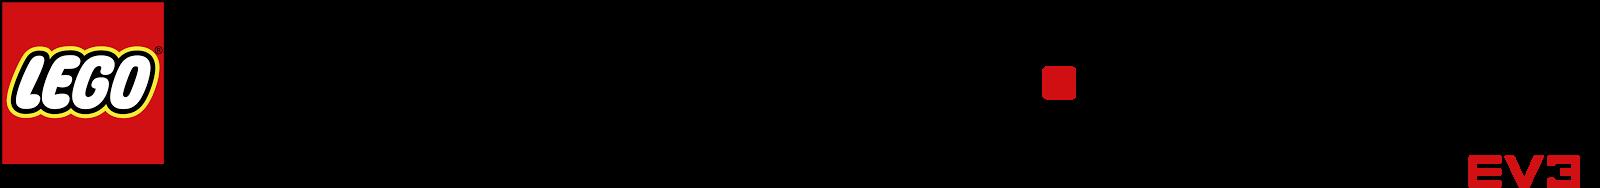 LEGO_MINDSTORM_EV3_RGB